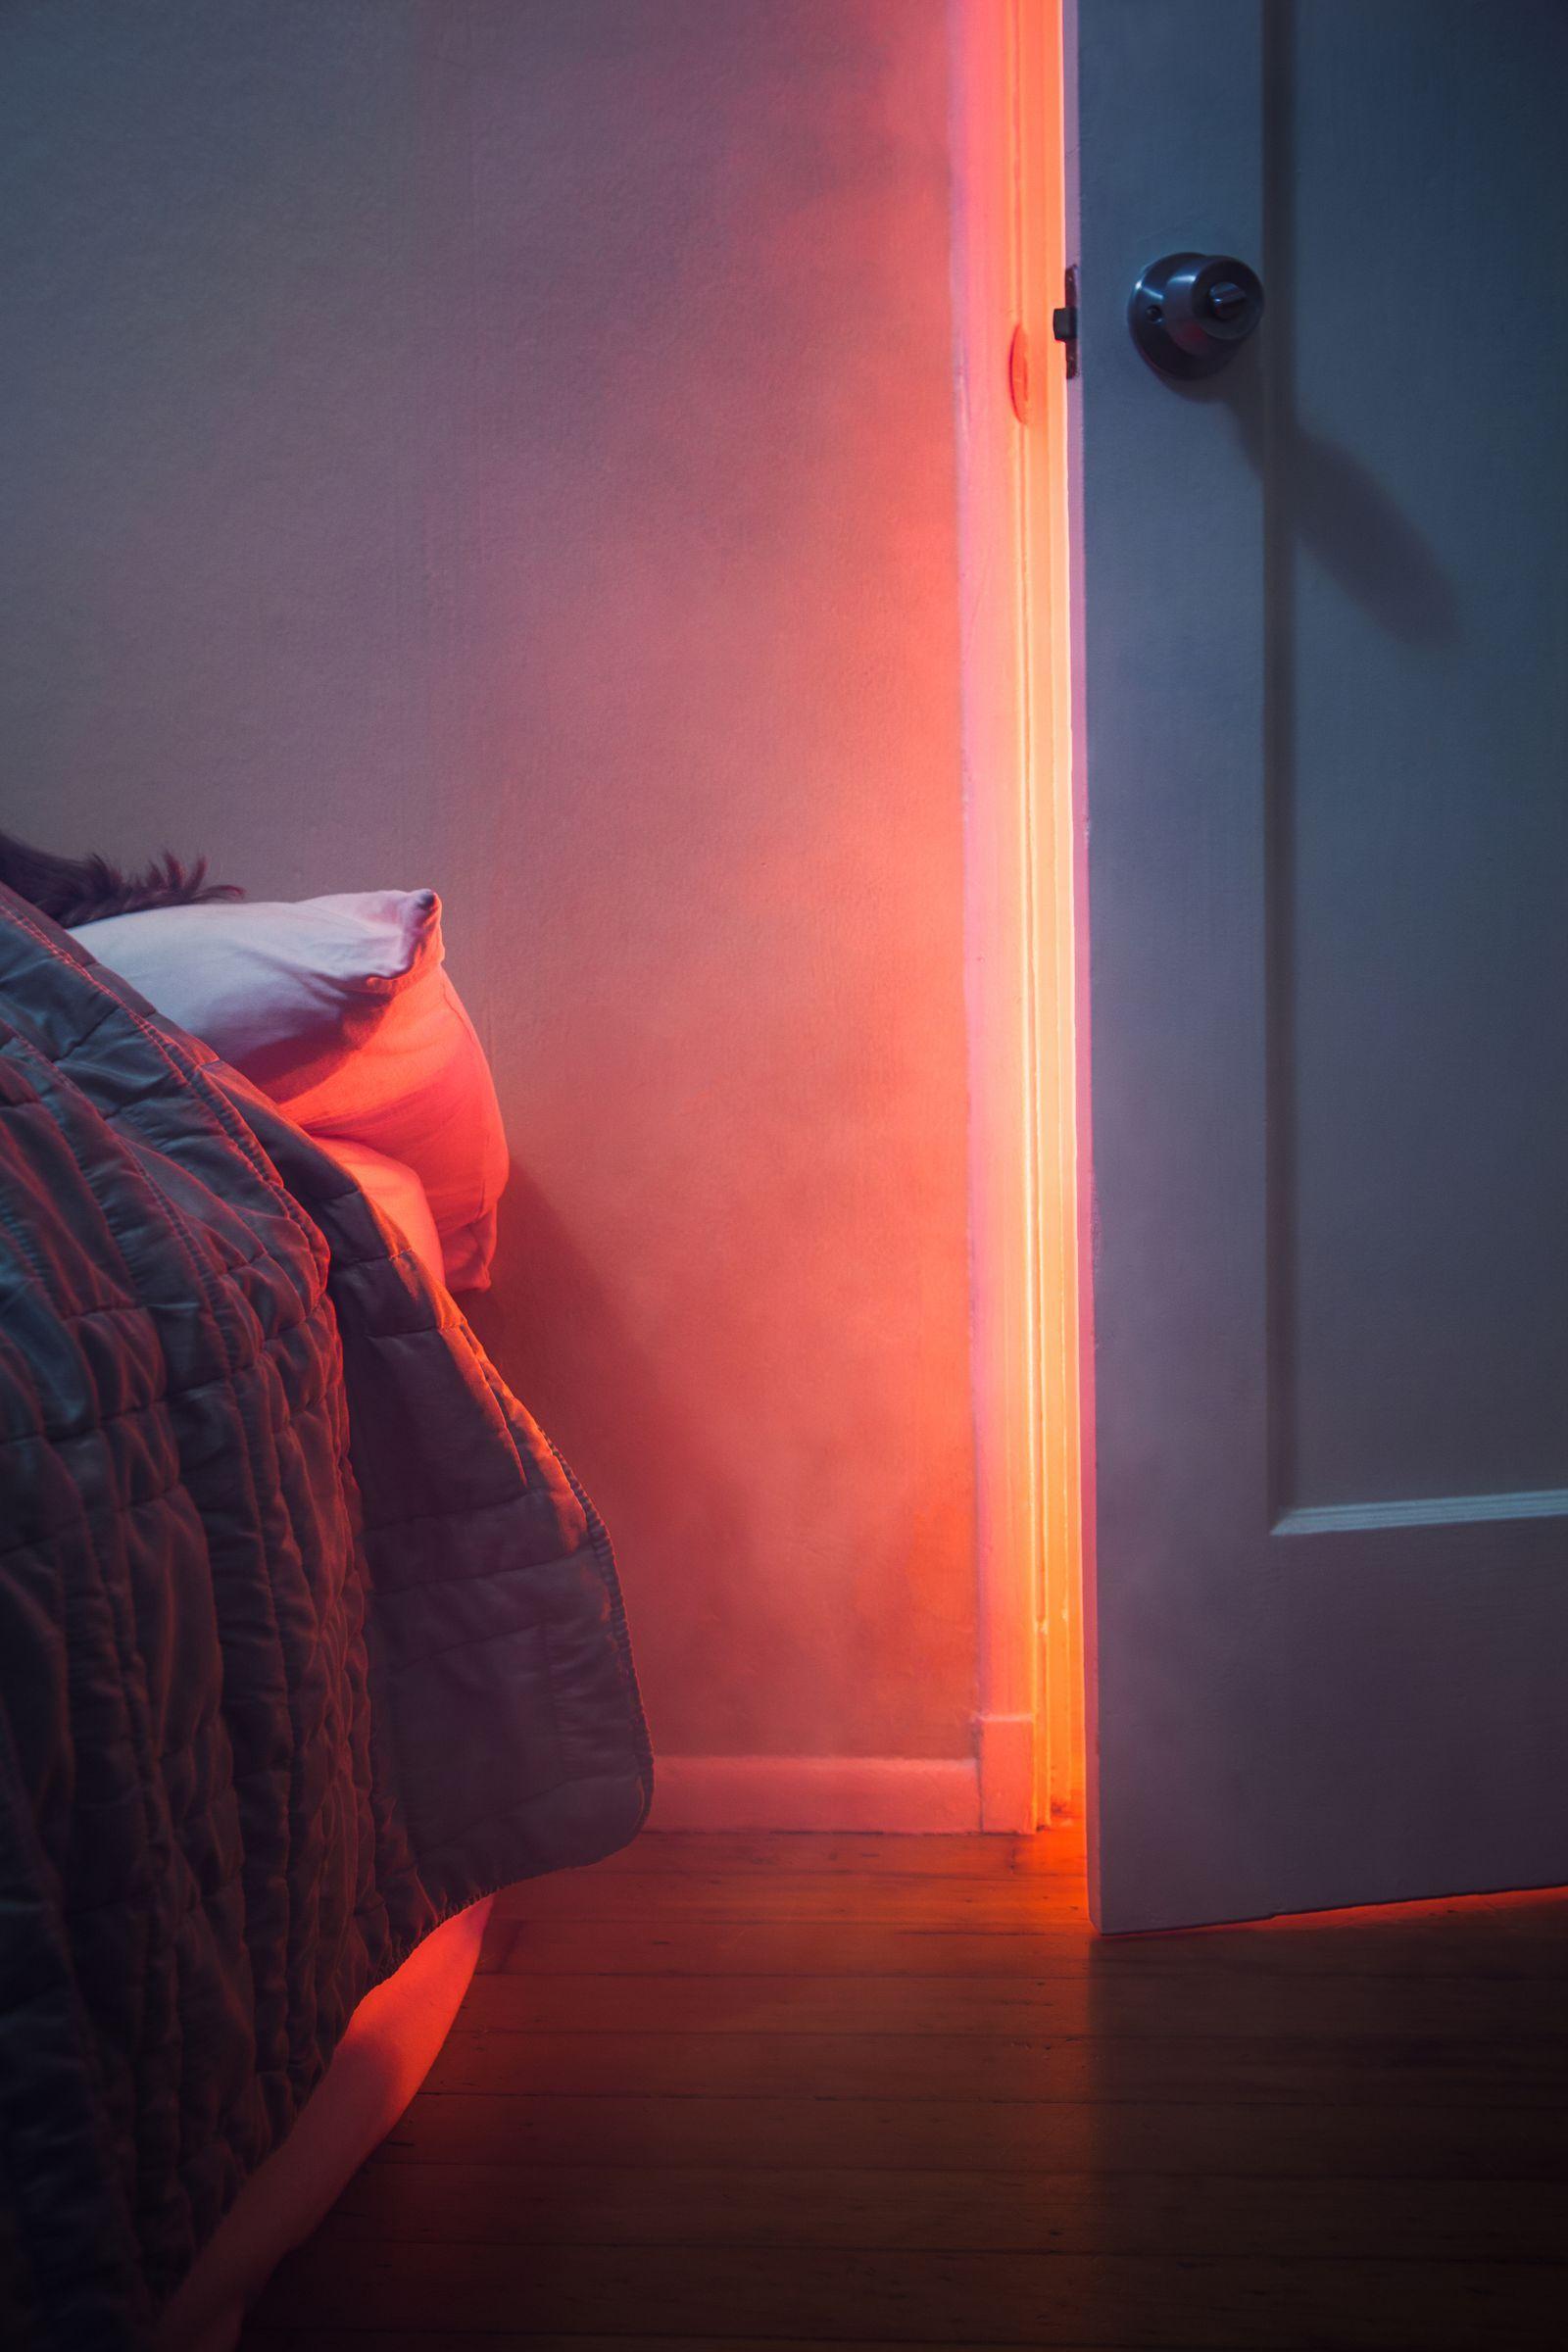 SAFETY ALERT Your Carbon Monoxide Alarm Probably Just